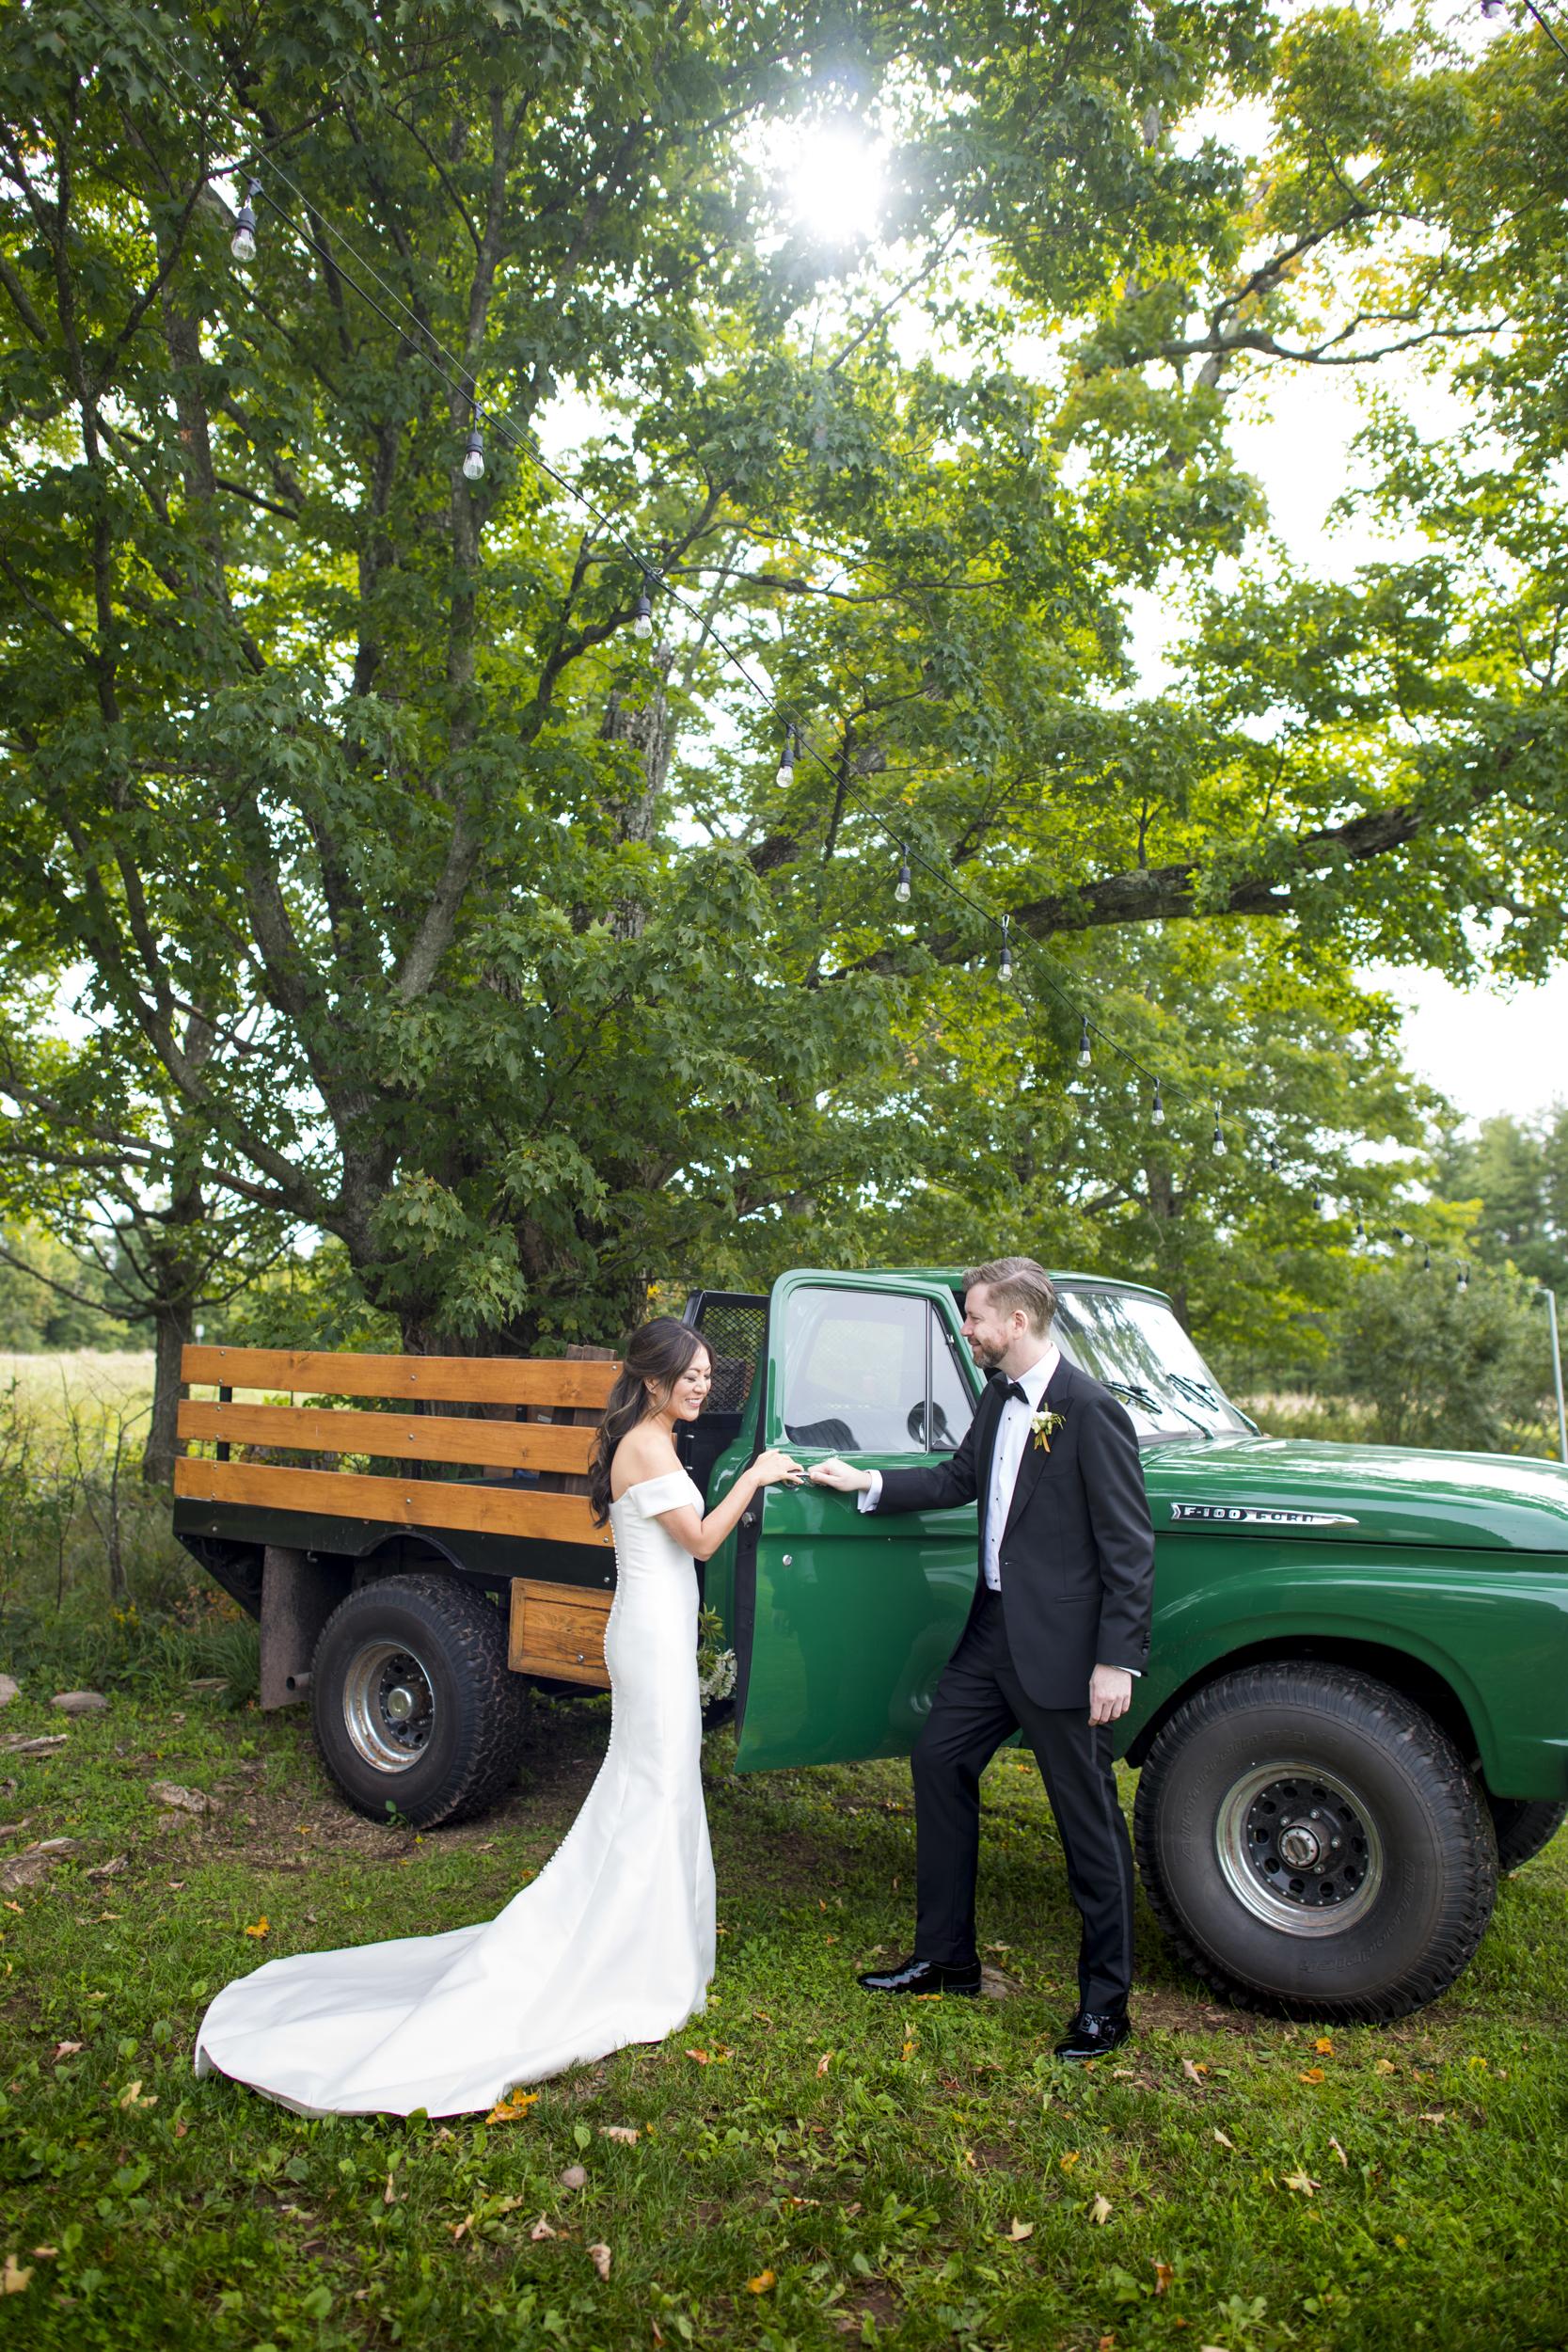 20180922_Brightsmith_CarolNick_Wedding_02994_2.jpg